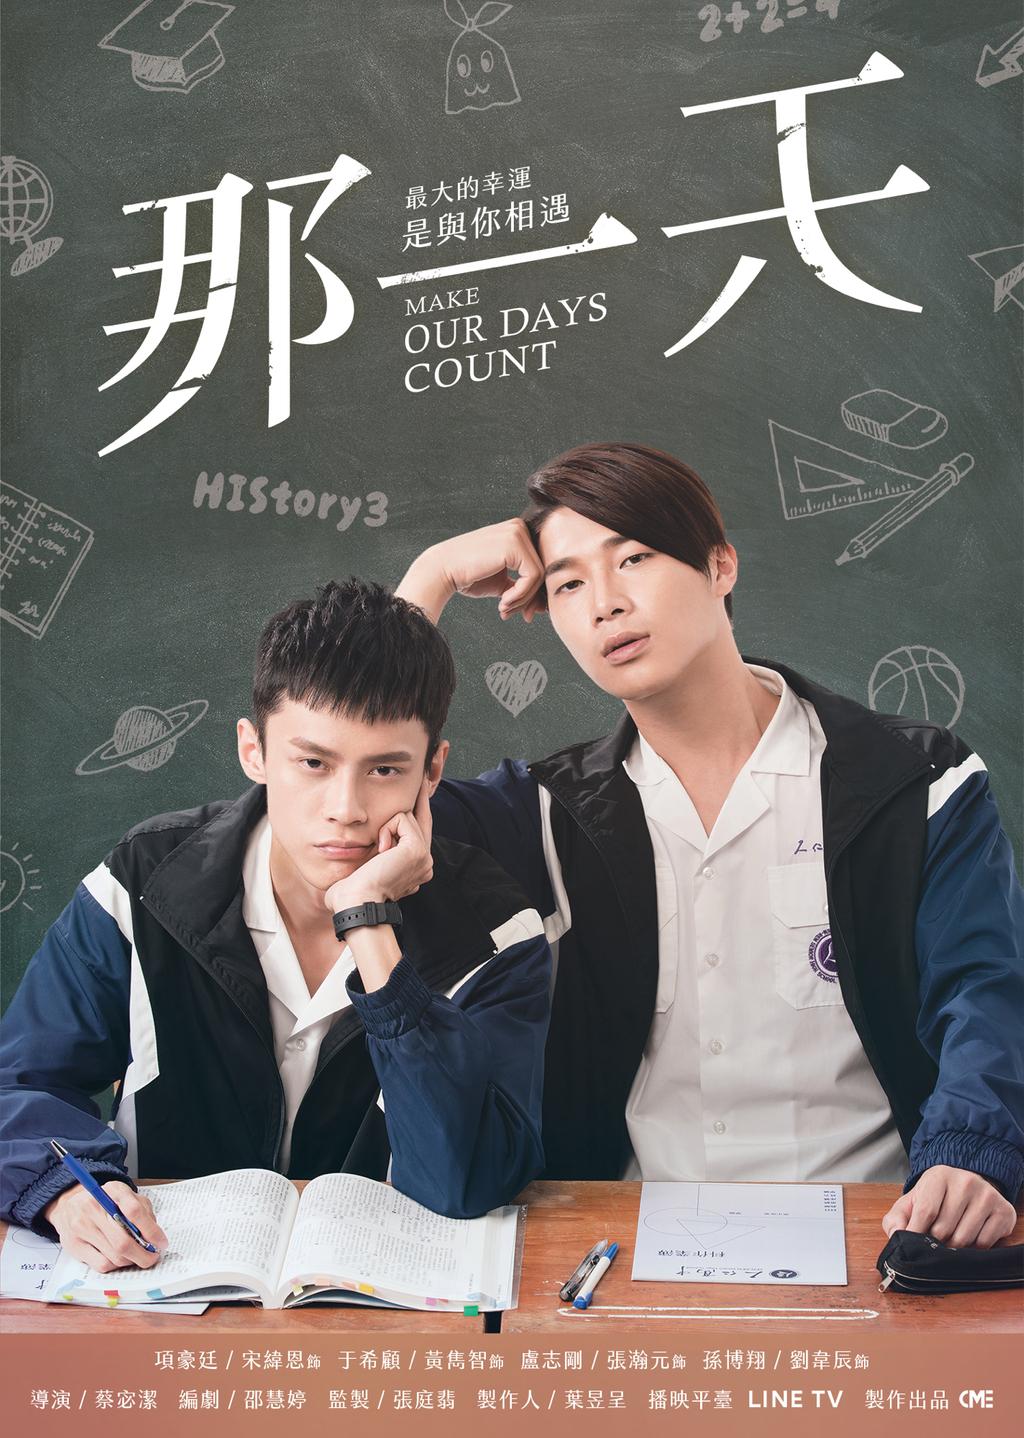 HIStory3-那一天05 心動 (上)|線上看|BL館|LINE TV-精彩隨看